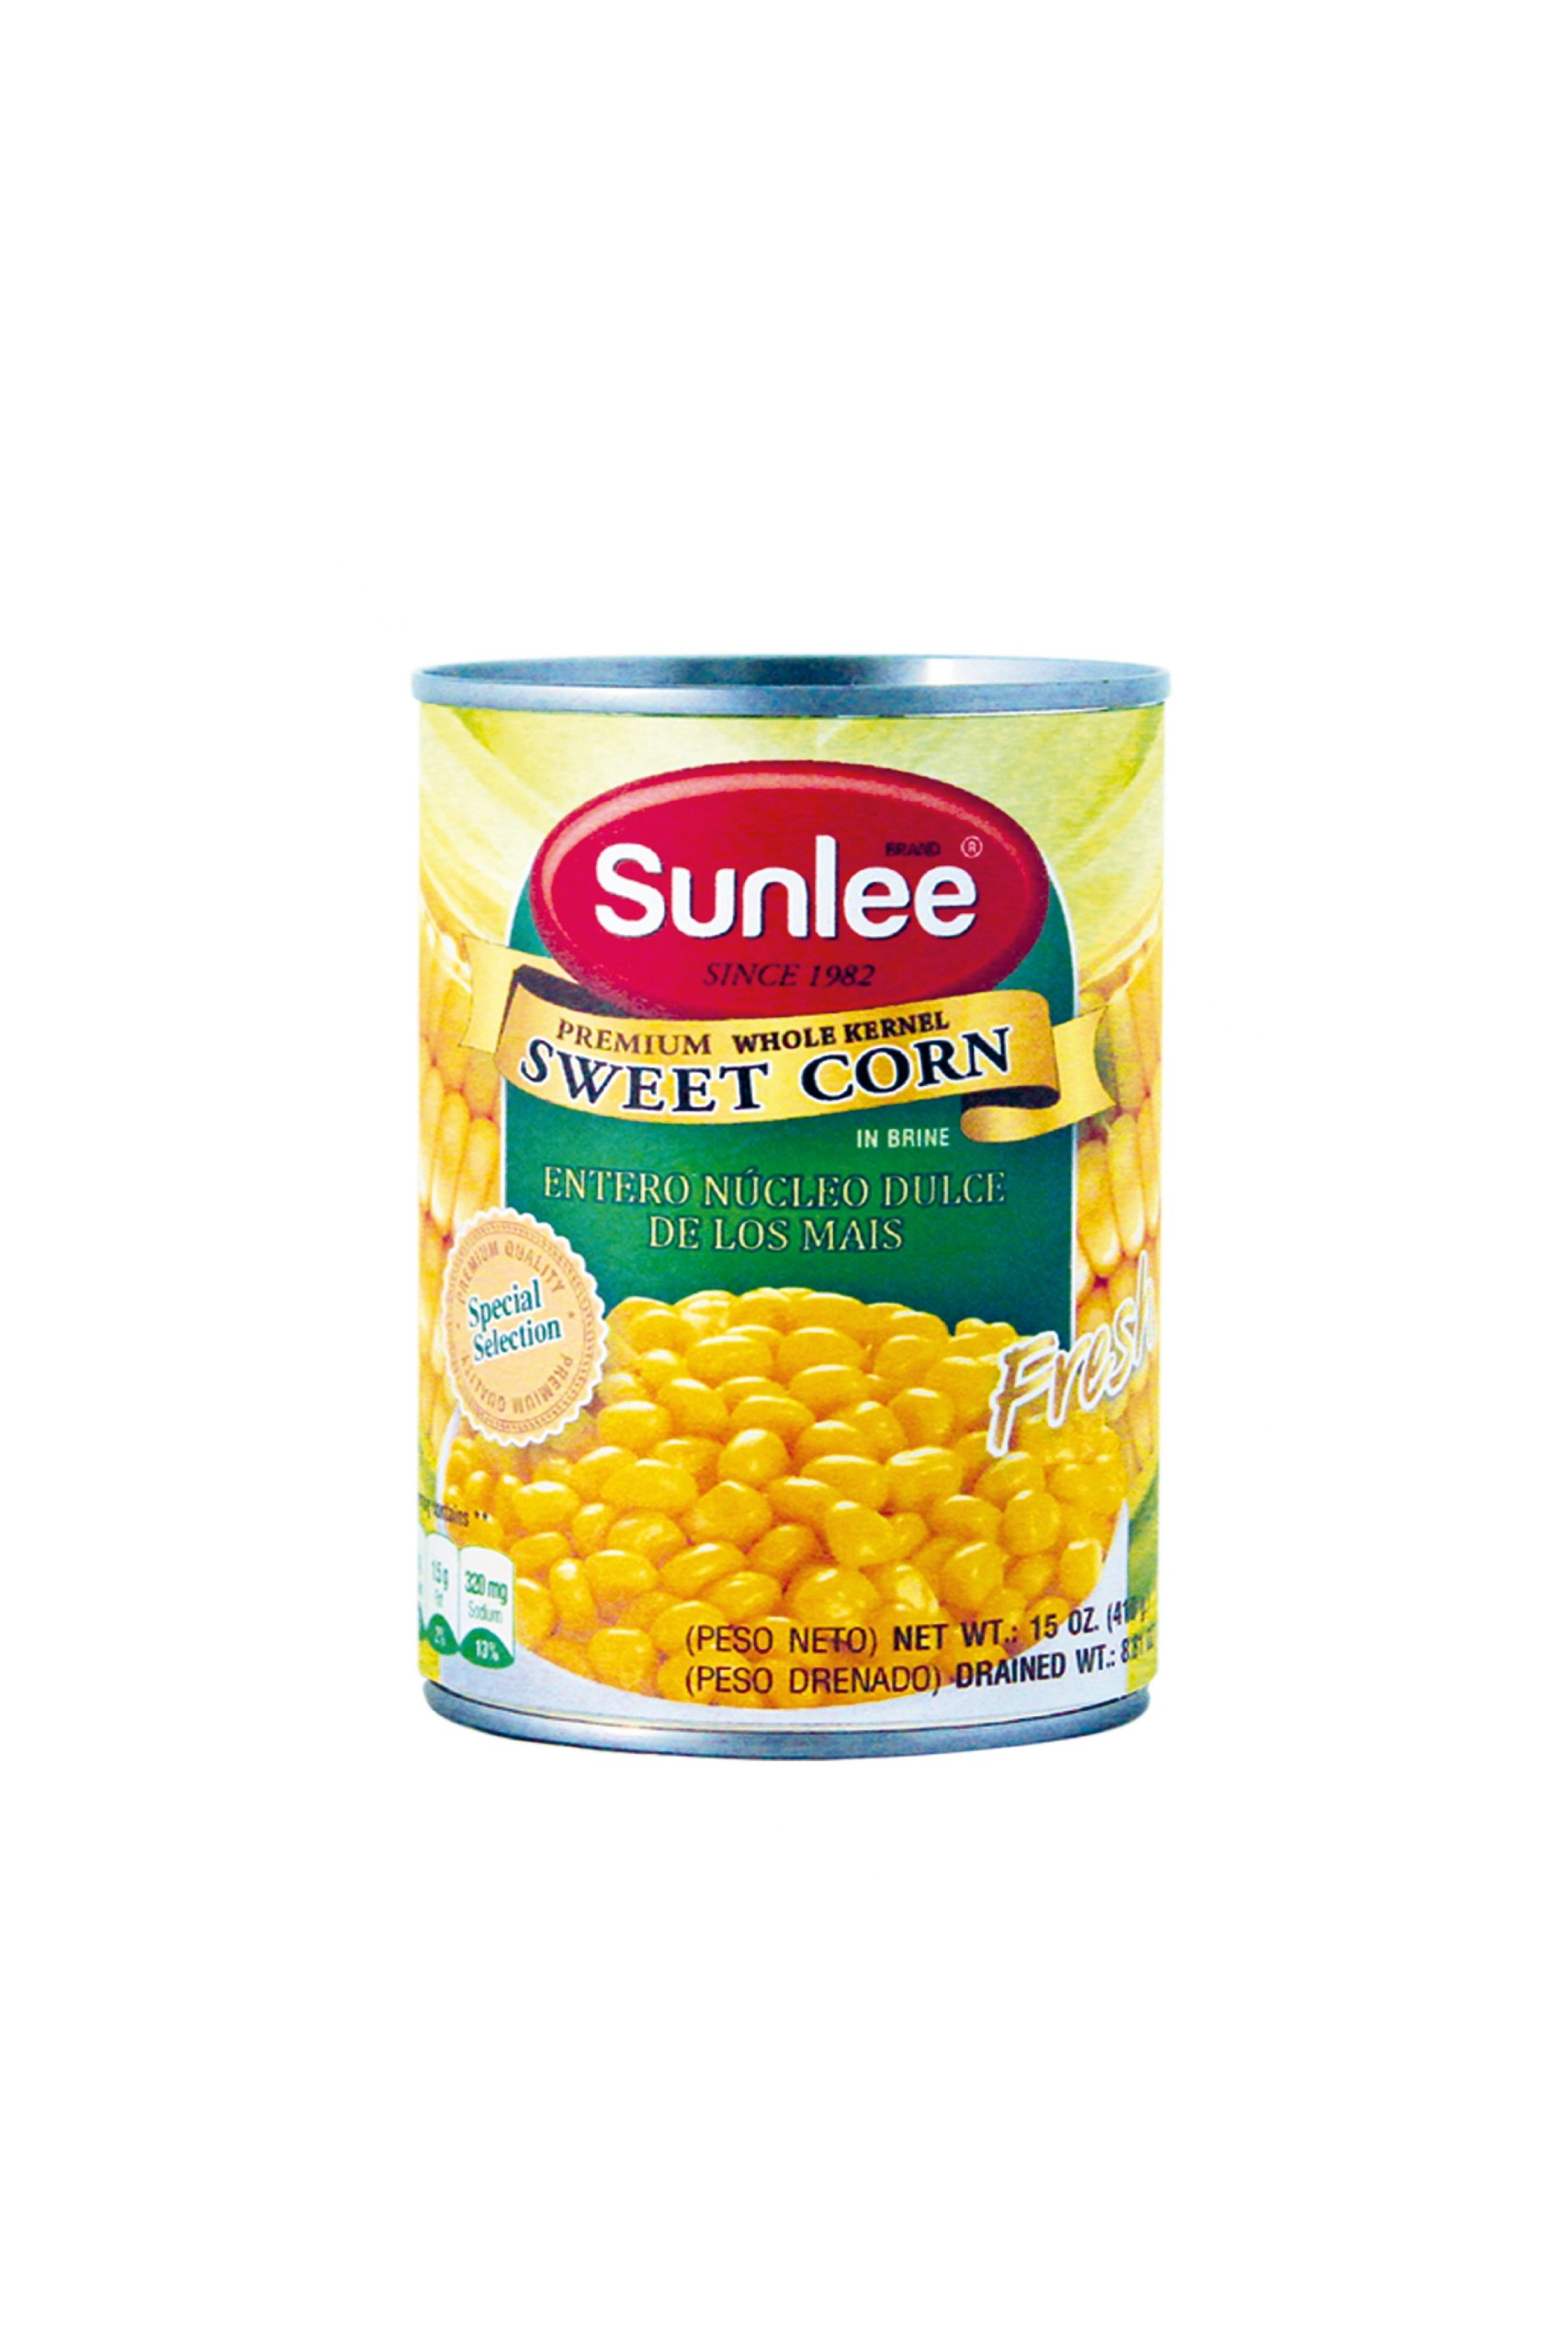 SUNLEE Whole Kernel Sweet Corn In Brine 15 OZ